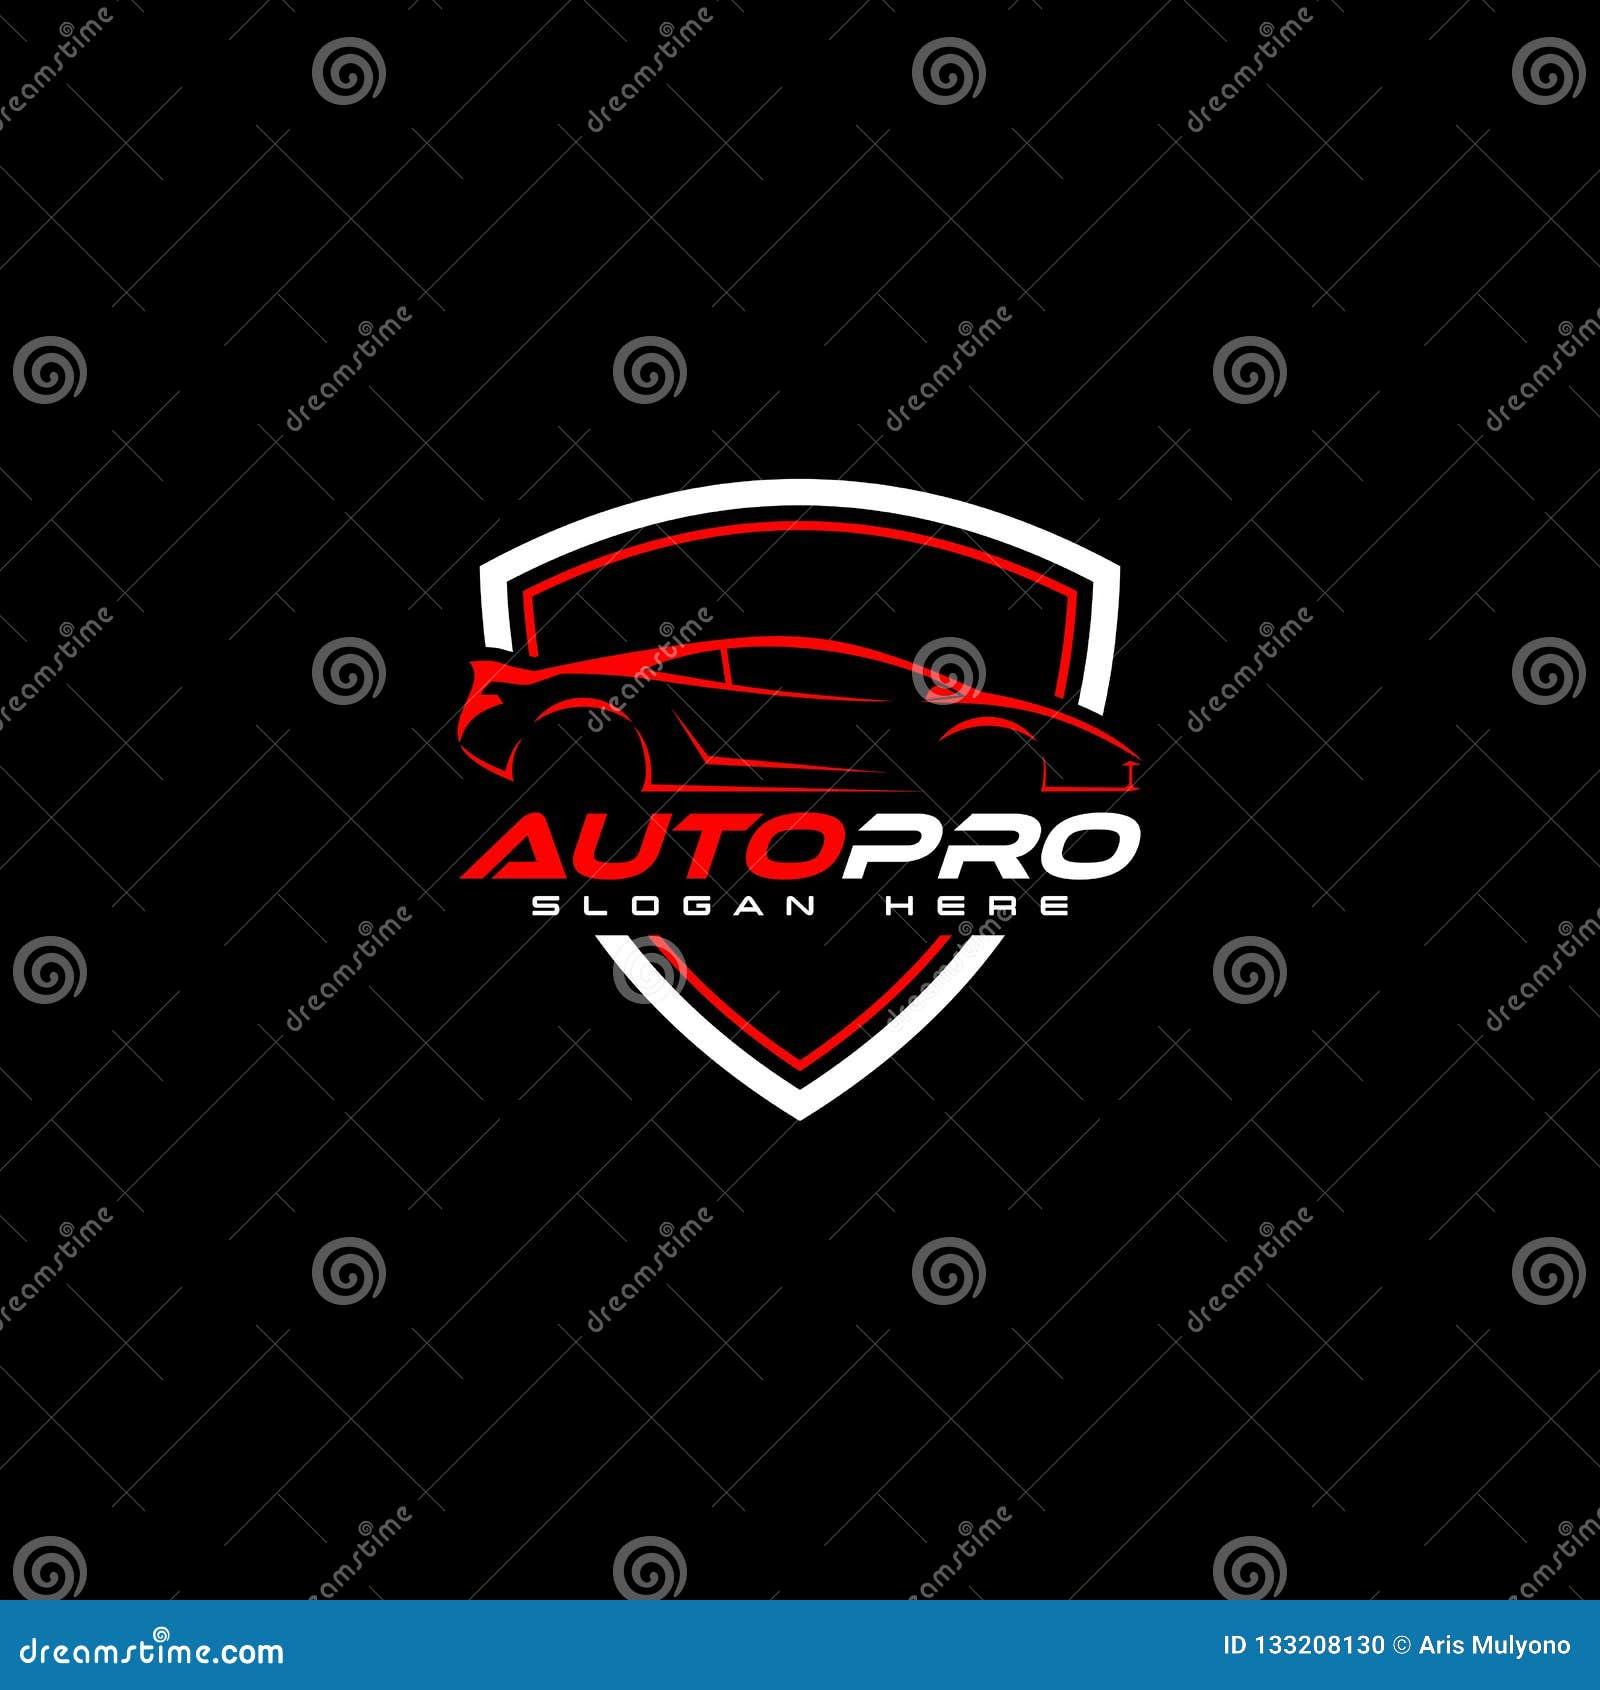 Modern Car Logo Design Inspiration Stock Illustration Illustration Of Illustration Isolated 133208130